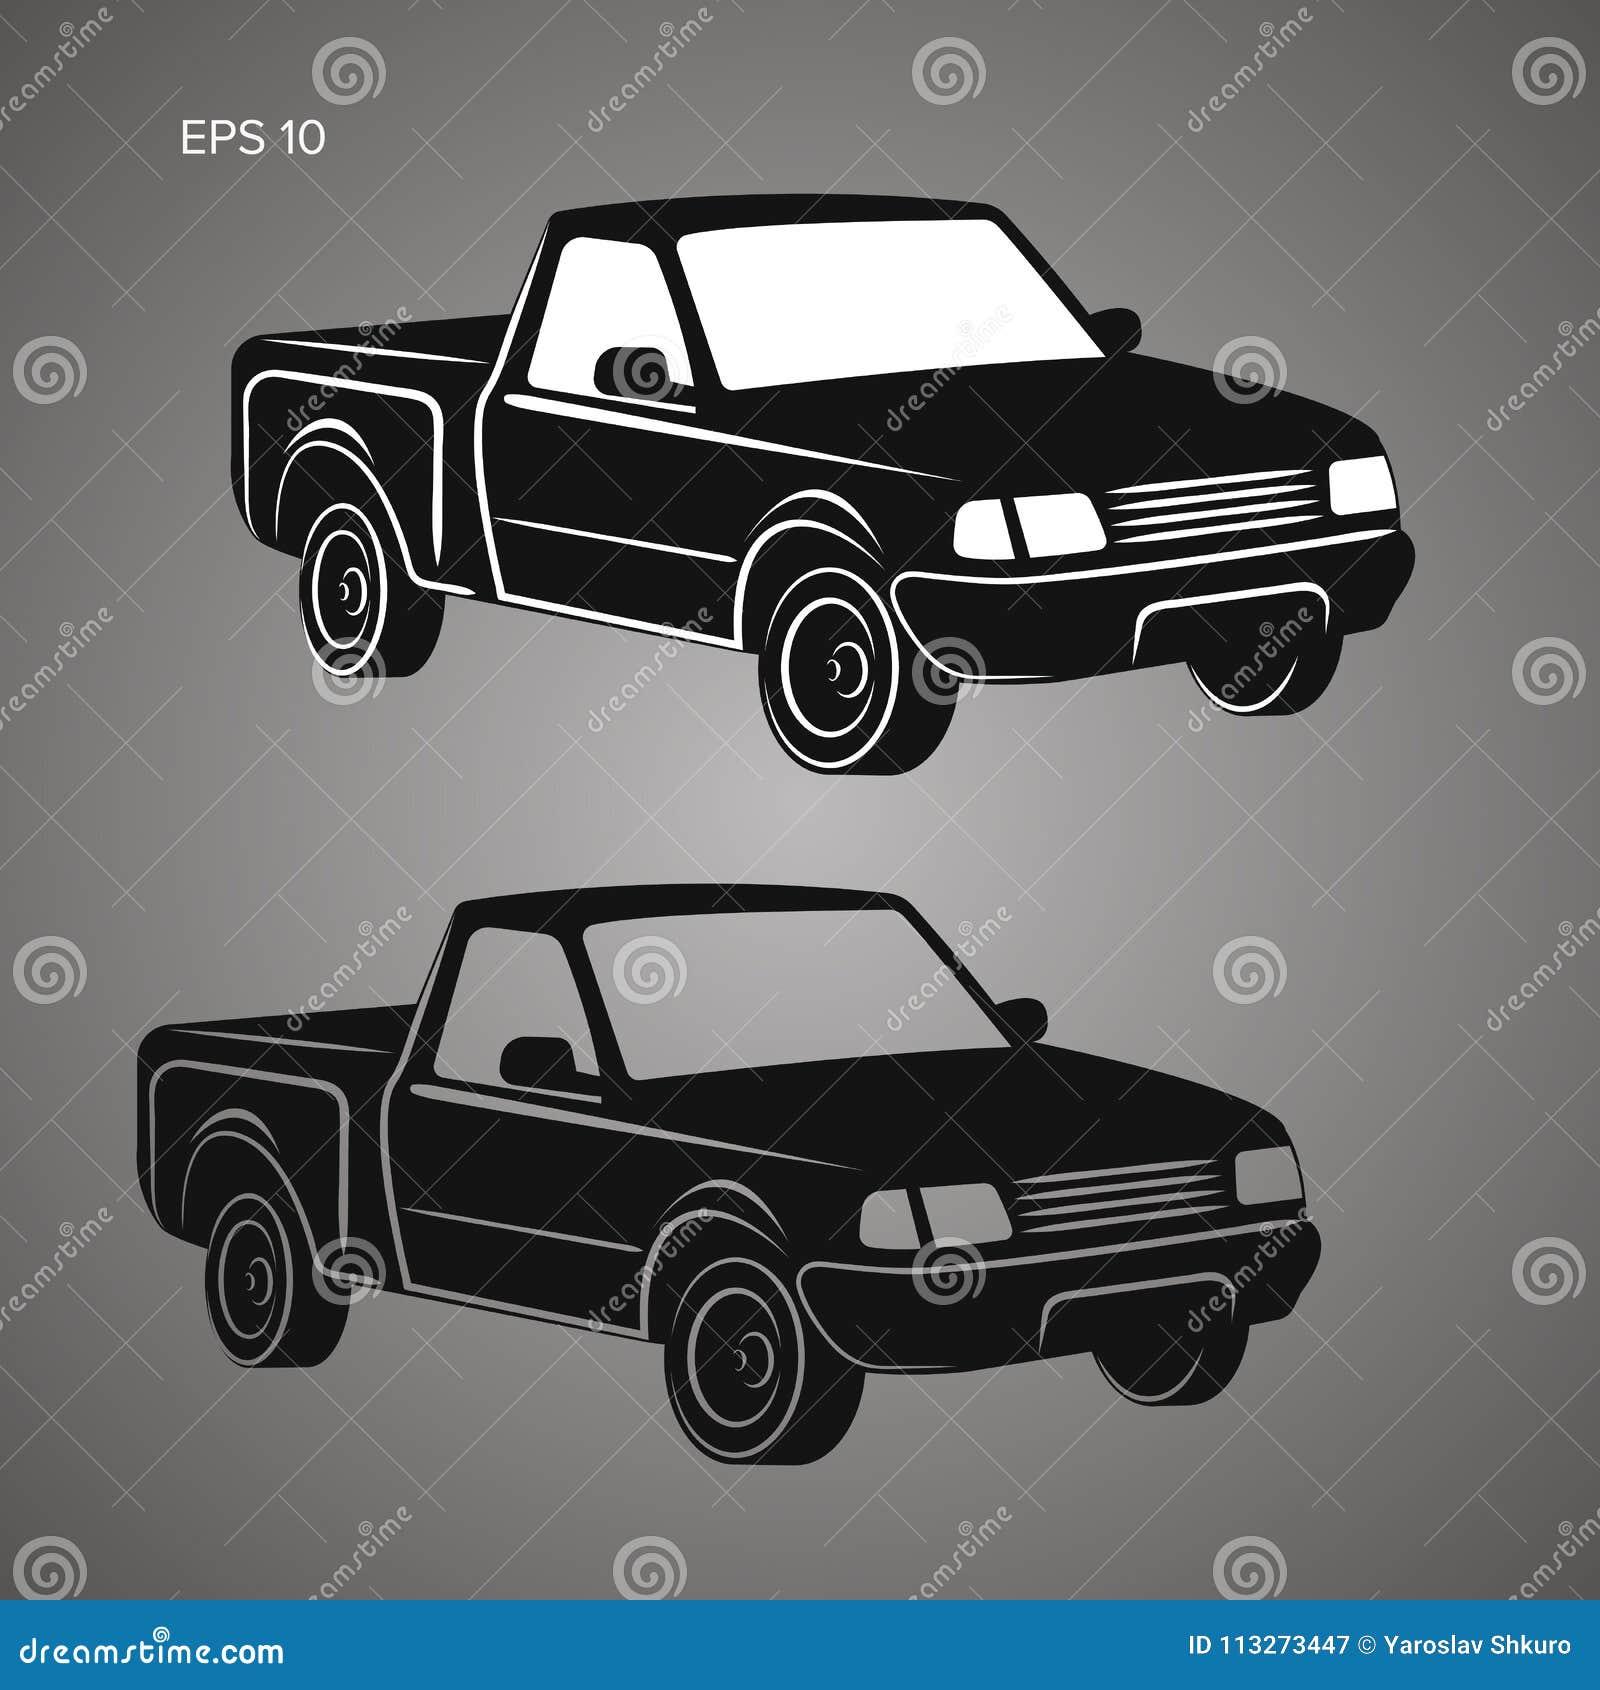 Modern Small Pickup Truck Vector Illustration Icon  Stock